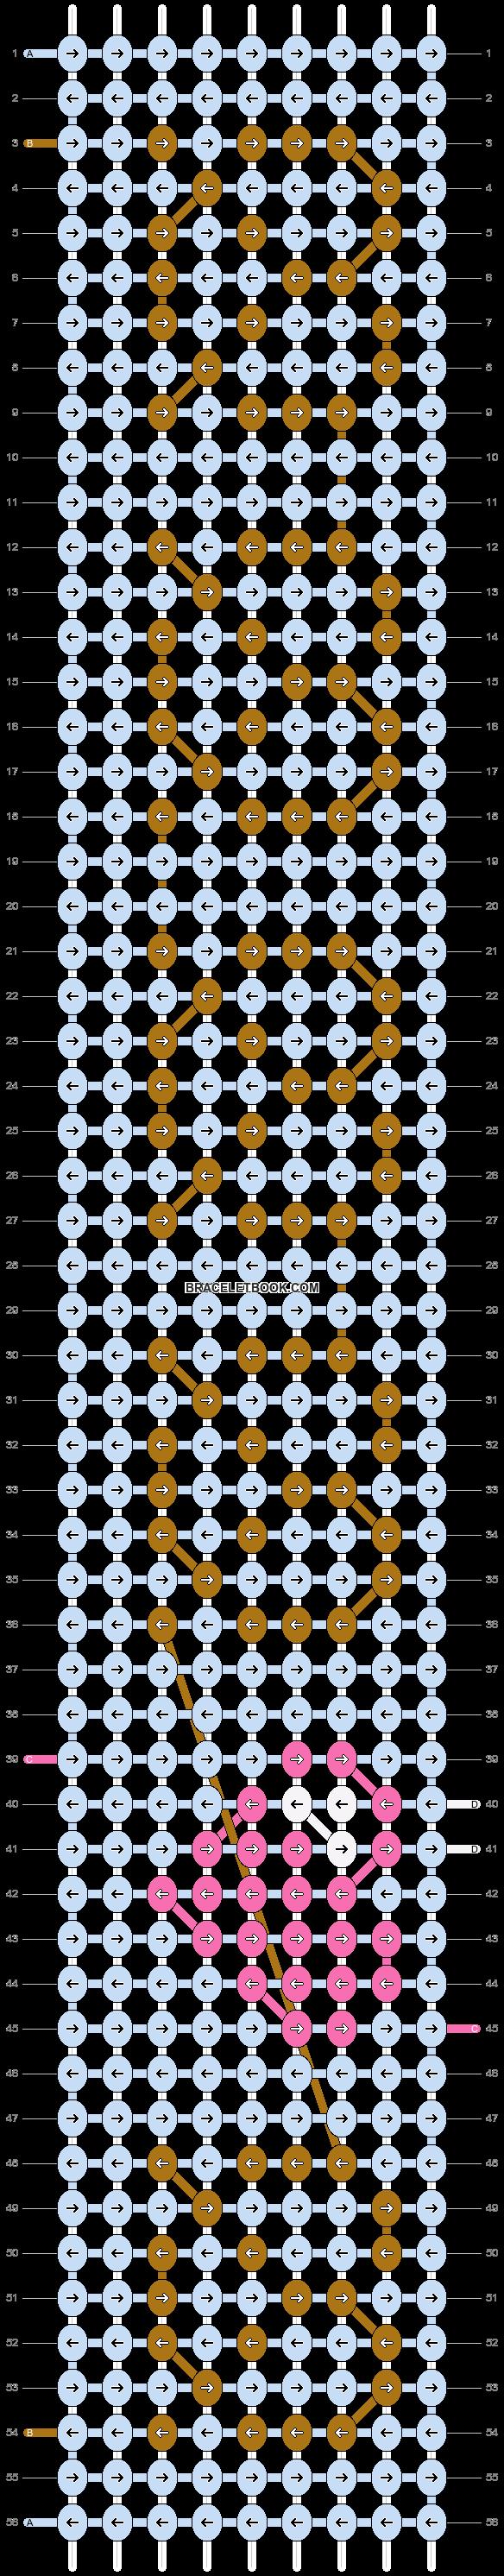 Alpha pattern #20435 pattern